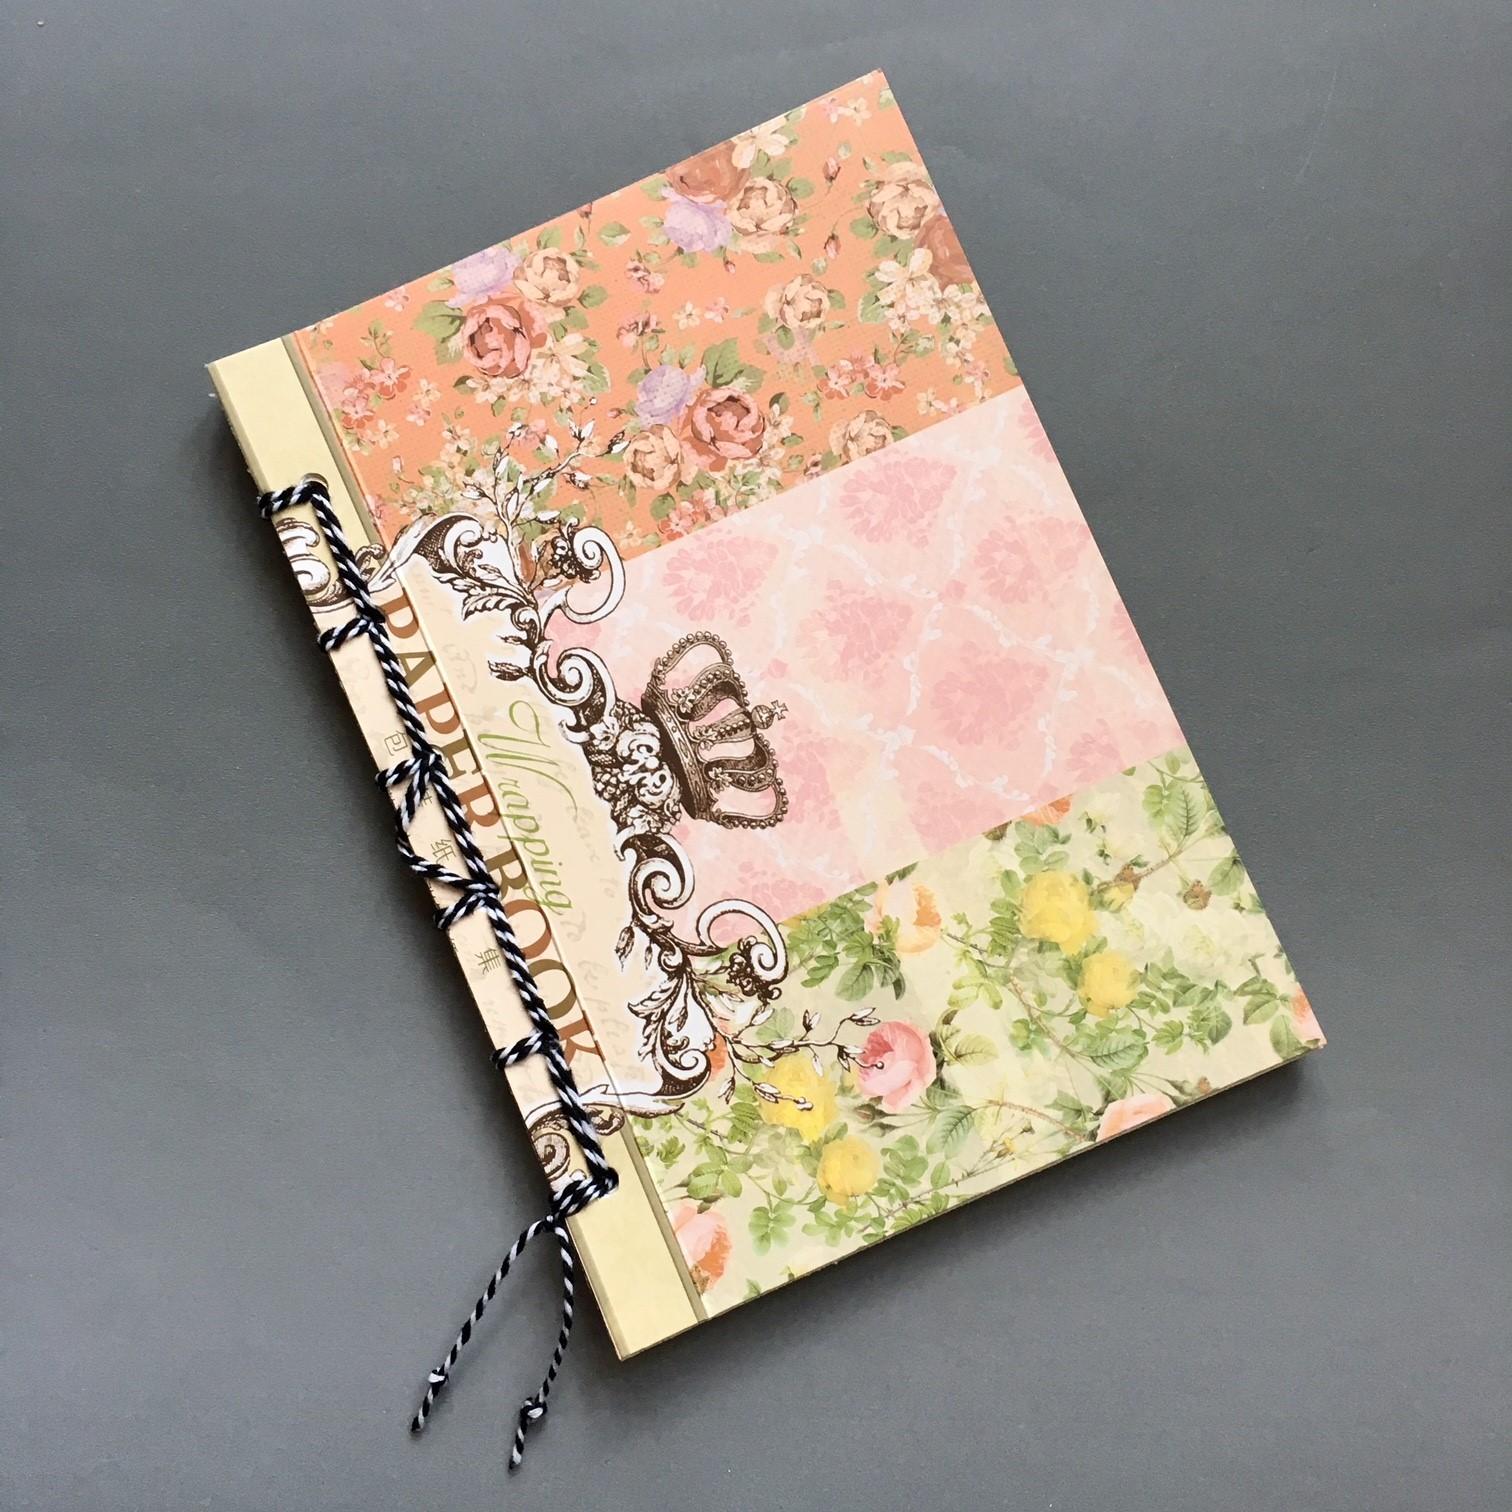 DIY smash journal with easy bookbinding